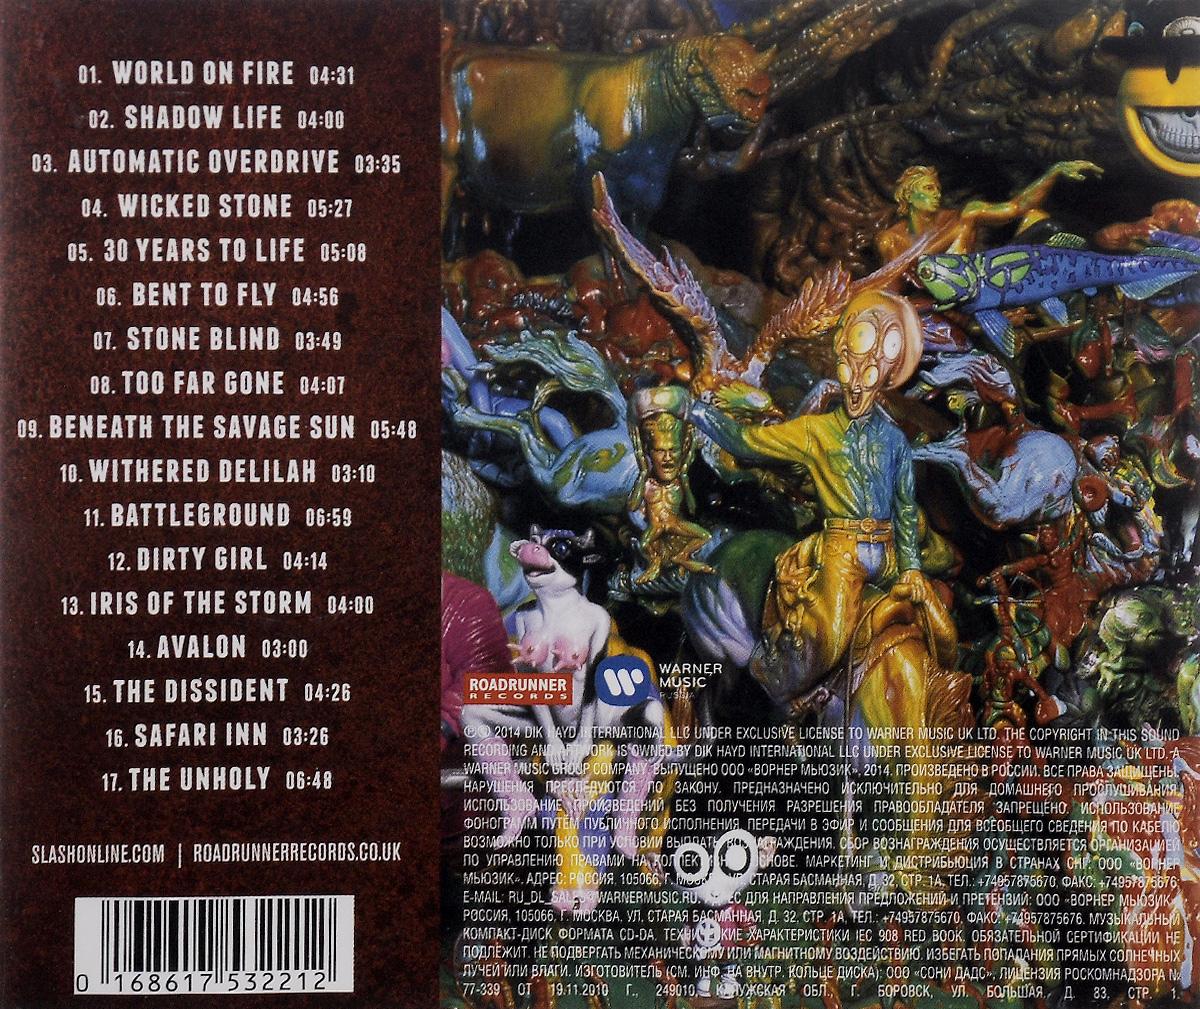 Slash.  World On Fire Roadrunner Records,Warner Music Russia